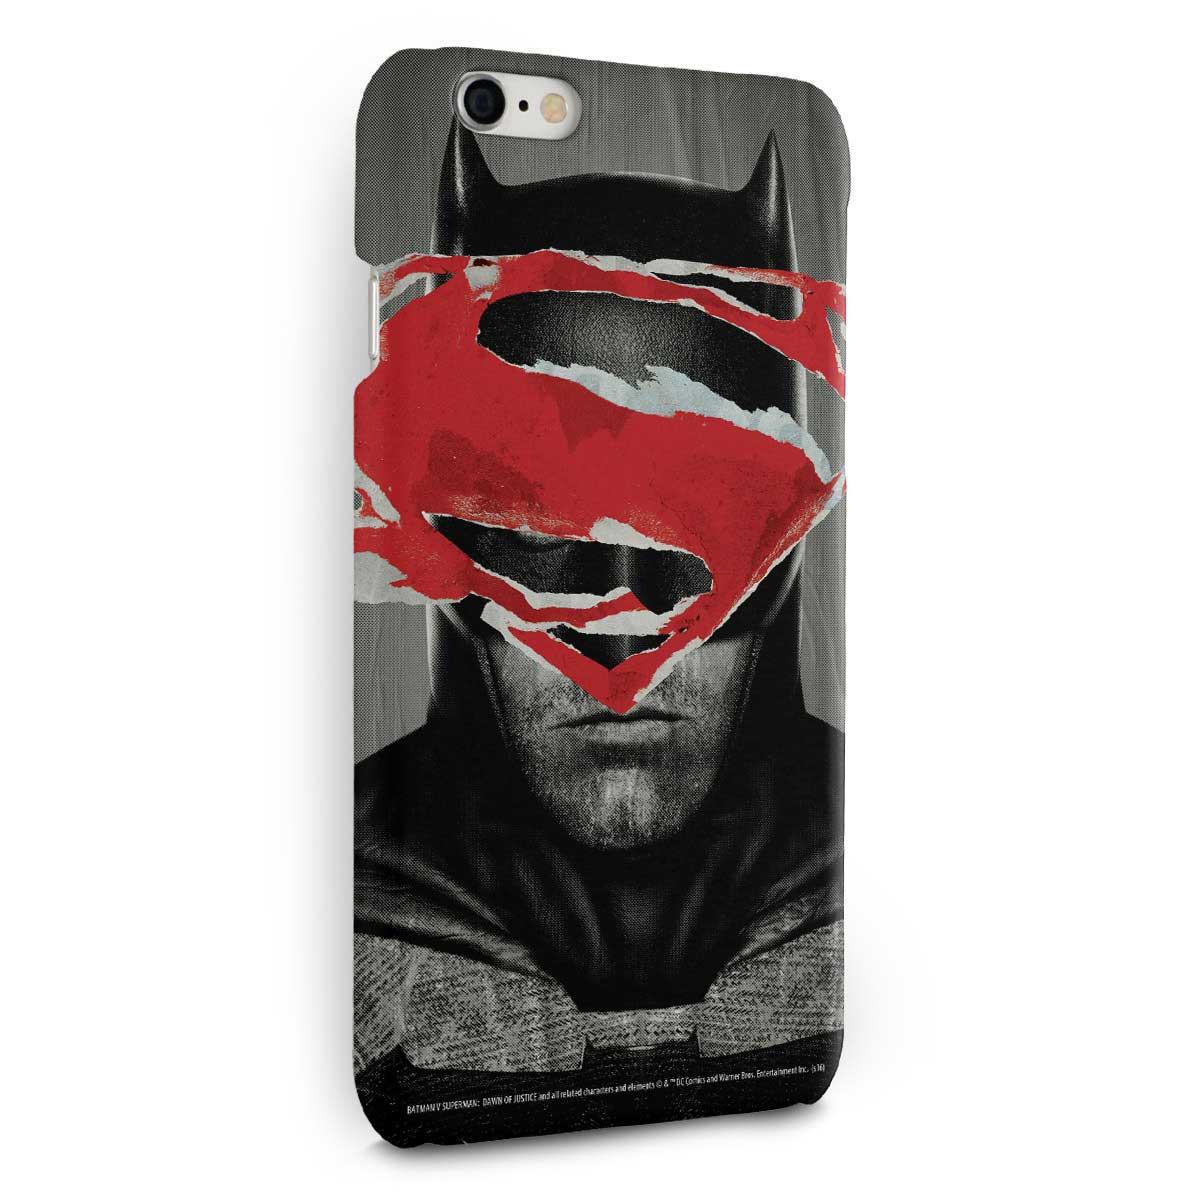 Capa para iPhone 6/6S Plus Batman VS Superman Day VS Night  - bandUP Store Marketplace